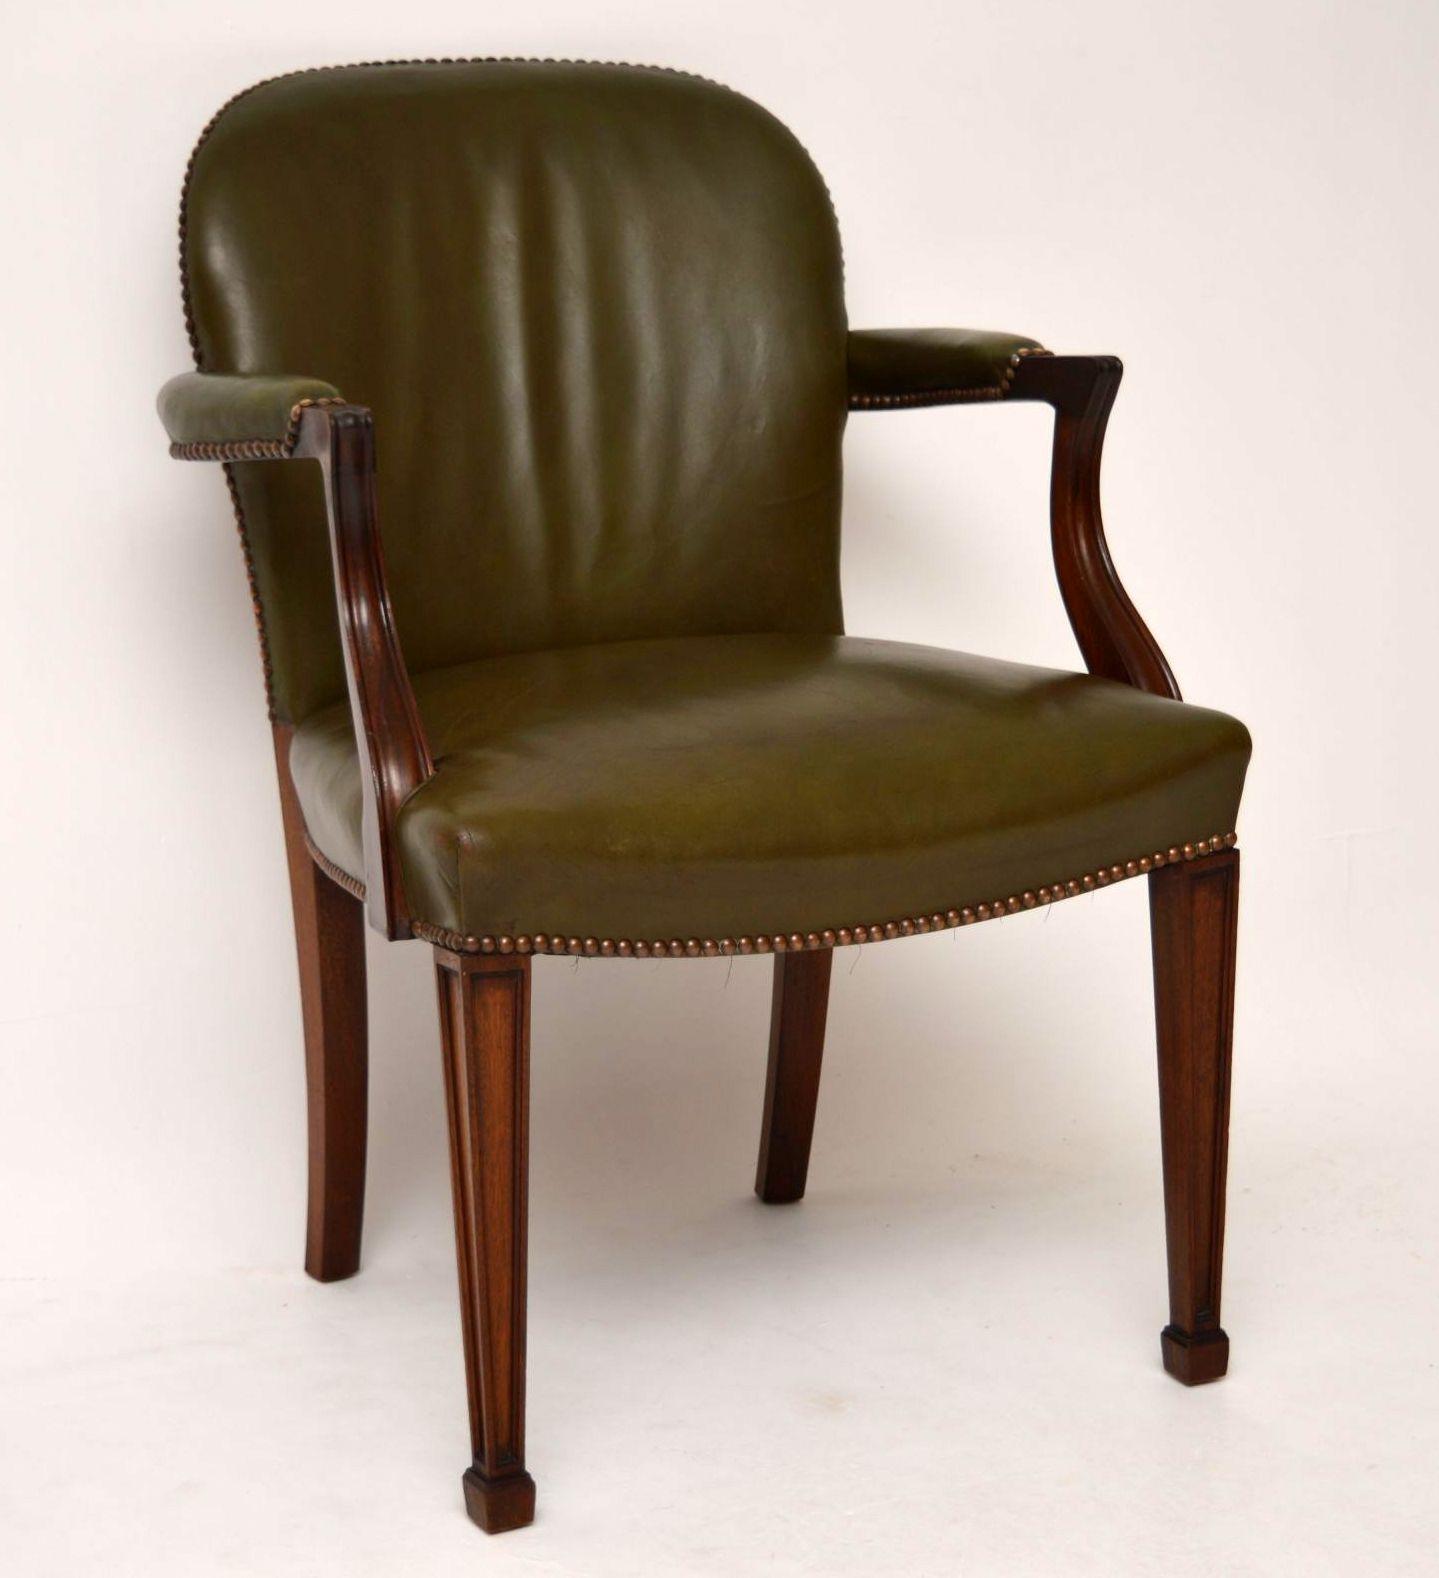 antiker mahagoni und leder schreibtischstuhl sessel. Black Bedroom Furniture Sets. Home Design Ideas